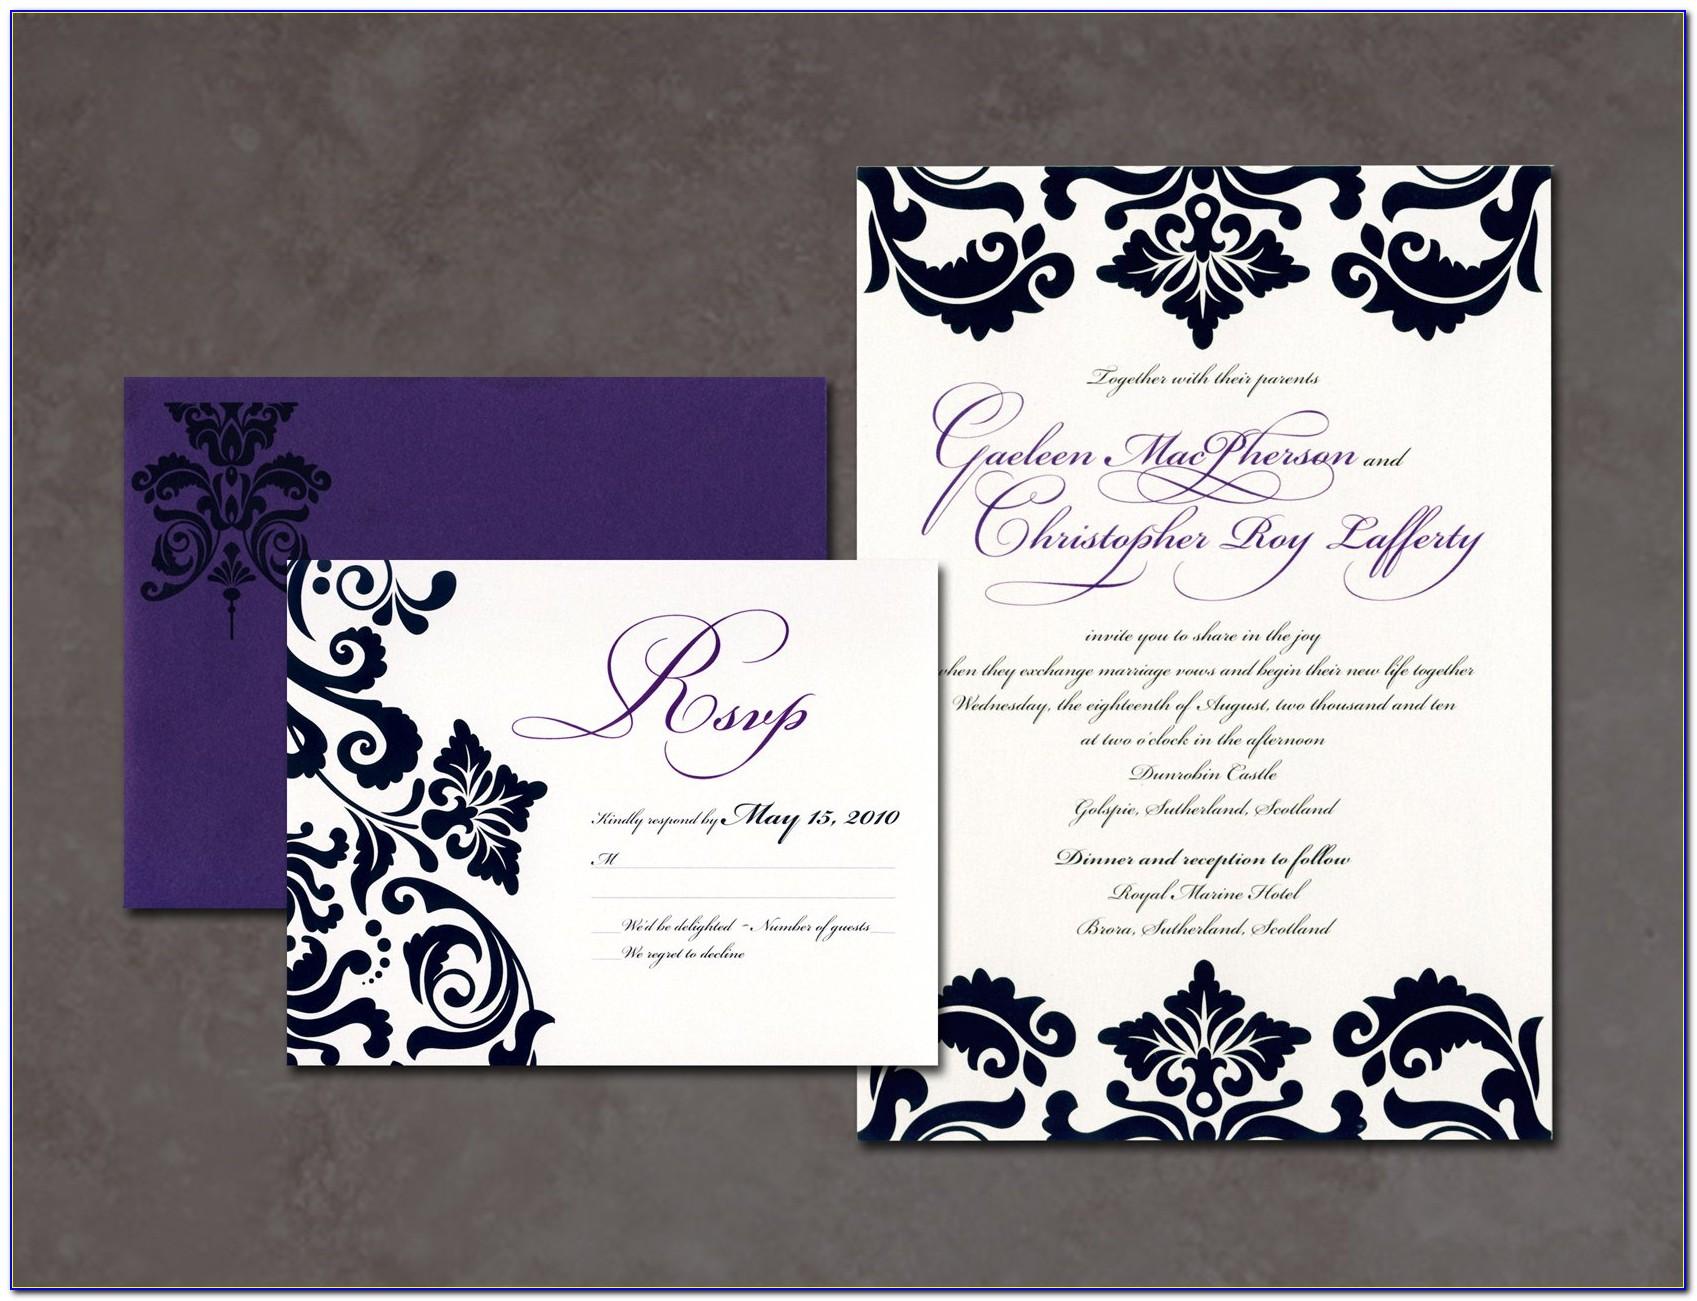 Wedding Invitation Photoshop Template Free Download